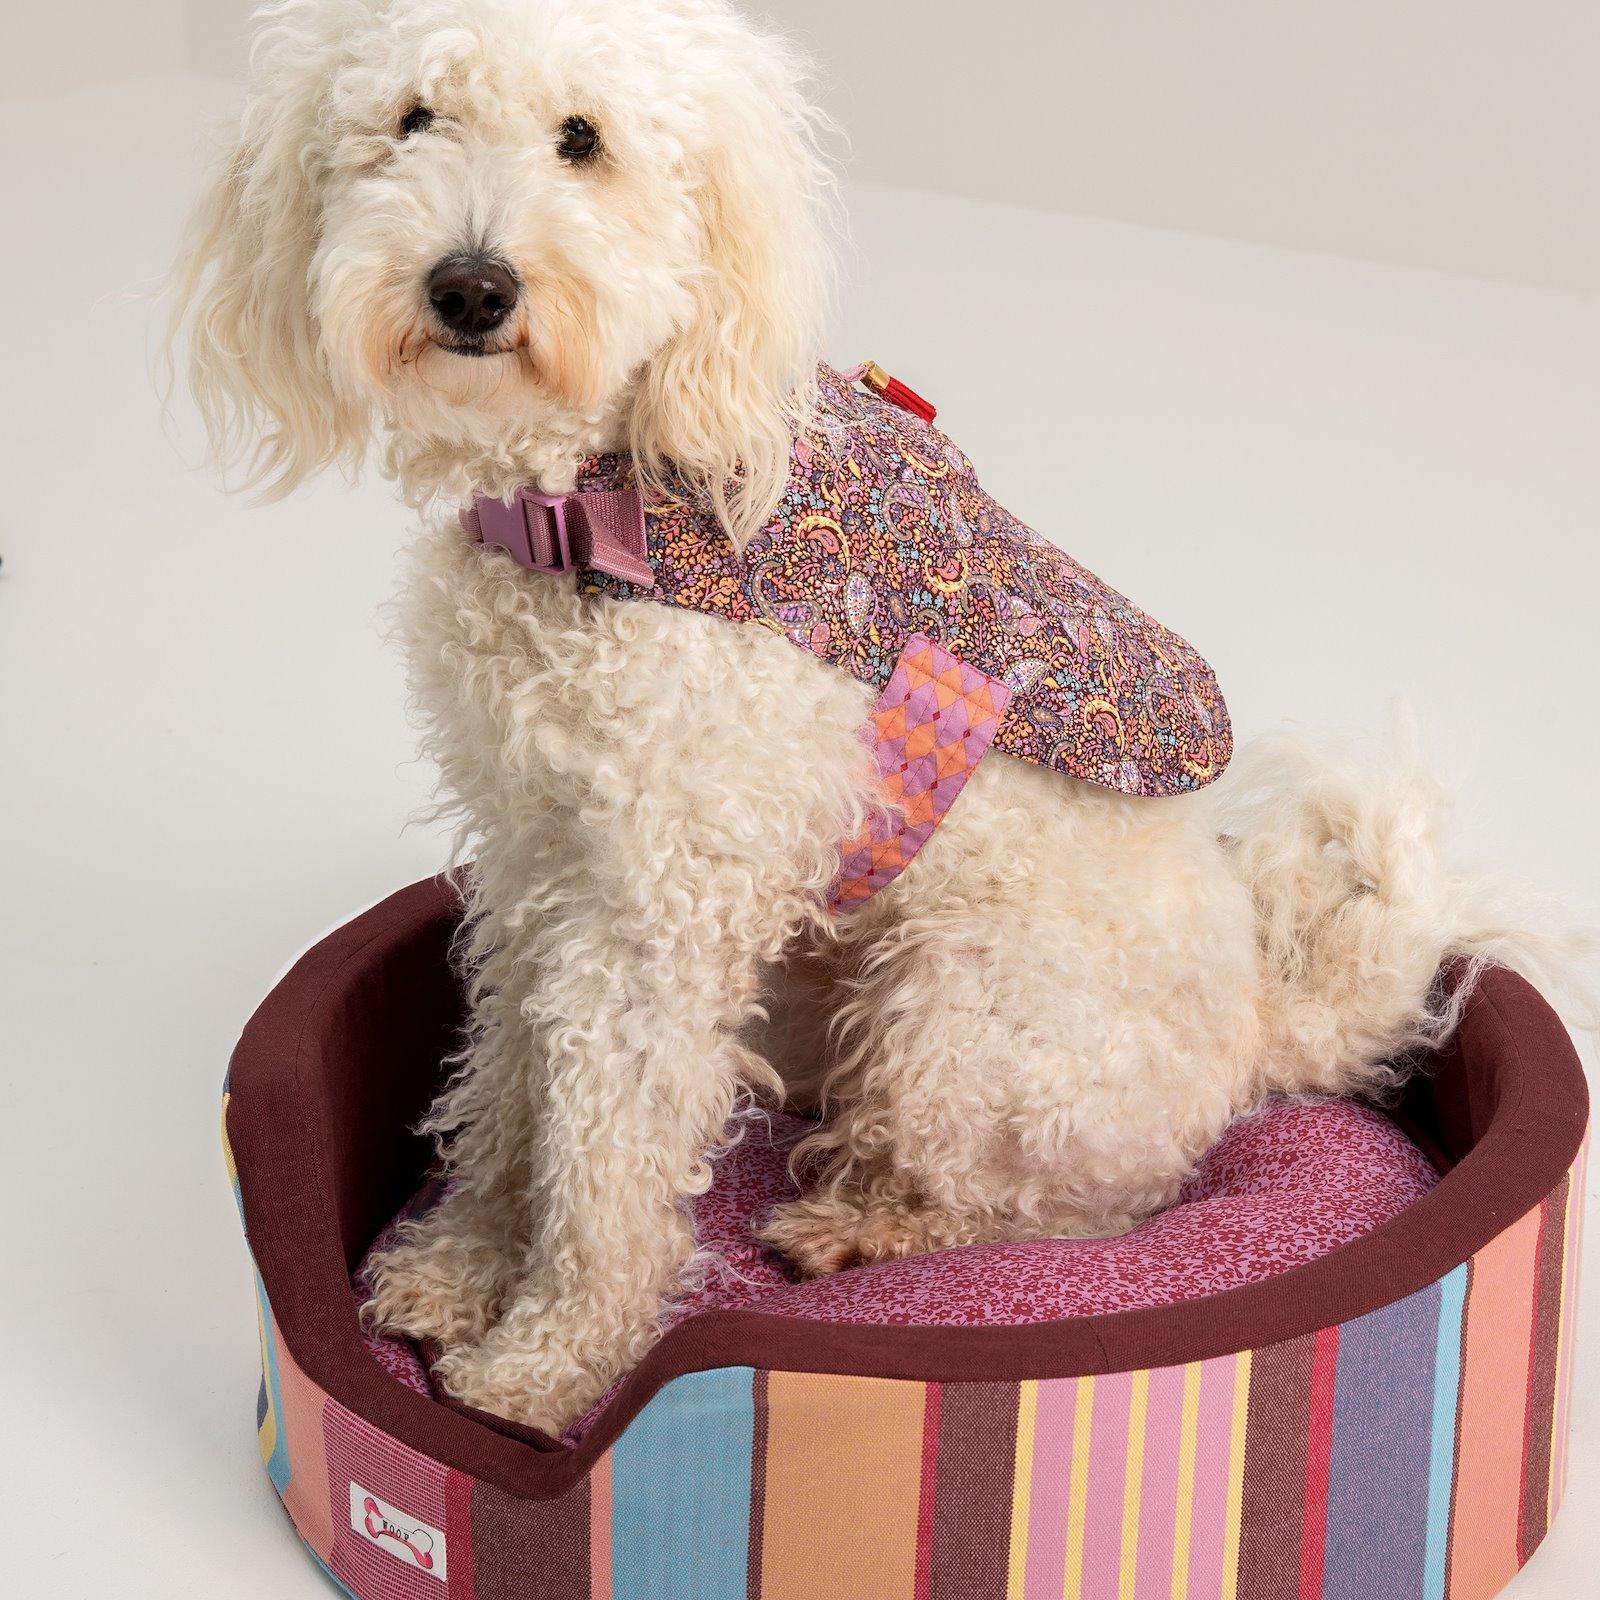 Dog basket p90348_780550_410144_852413_24848_bundle